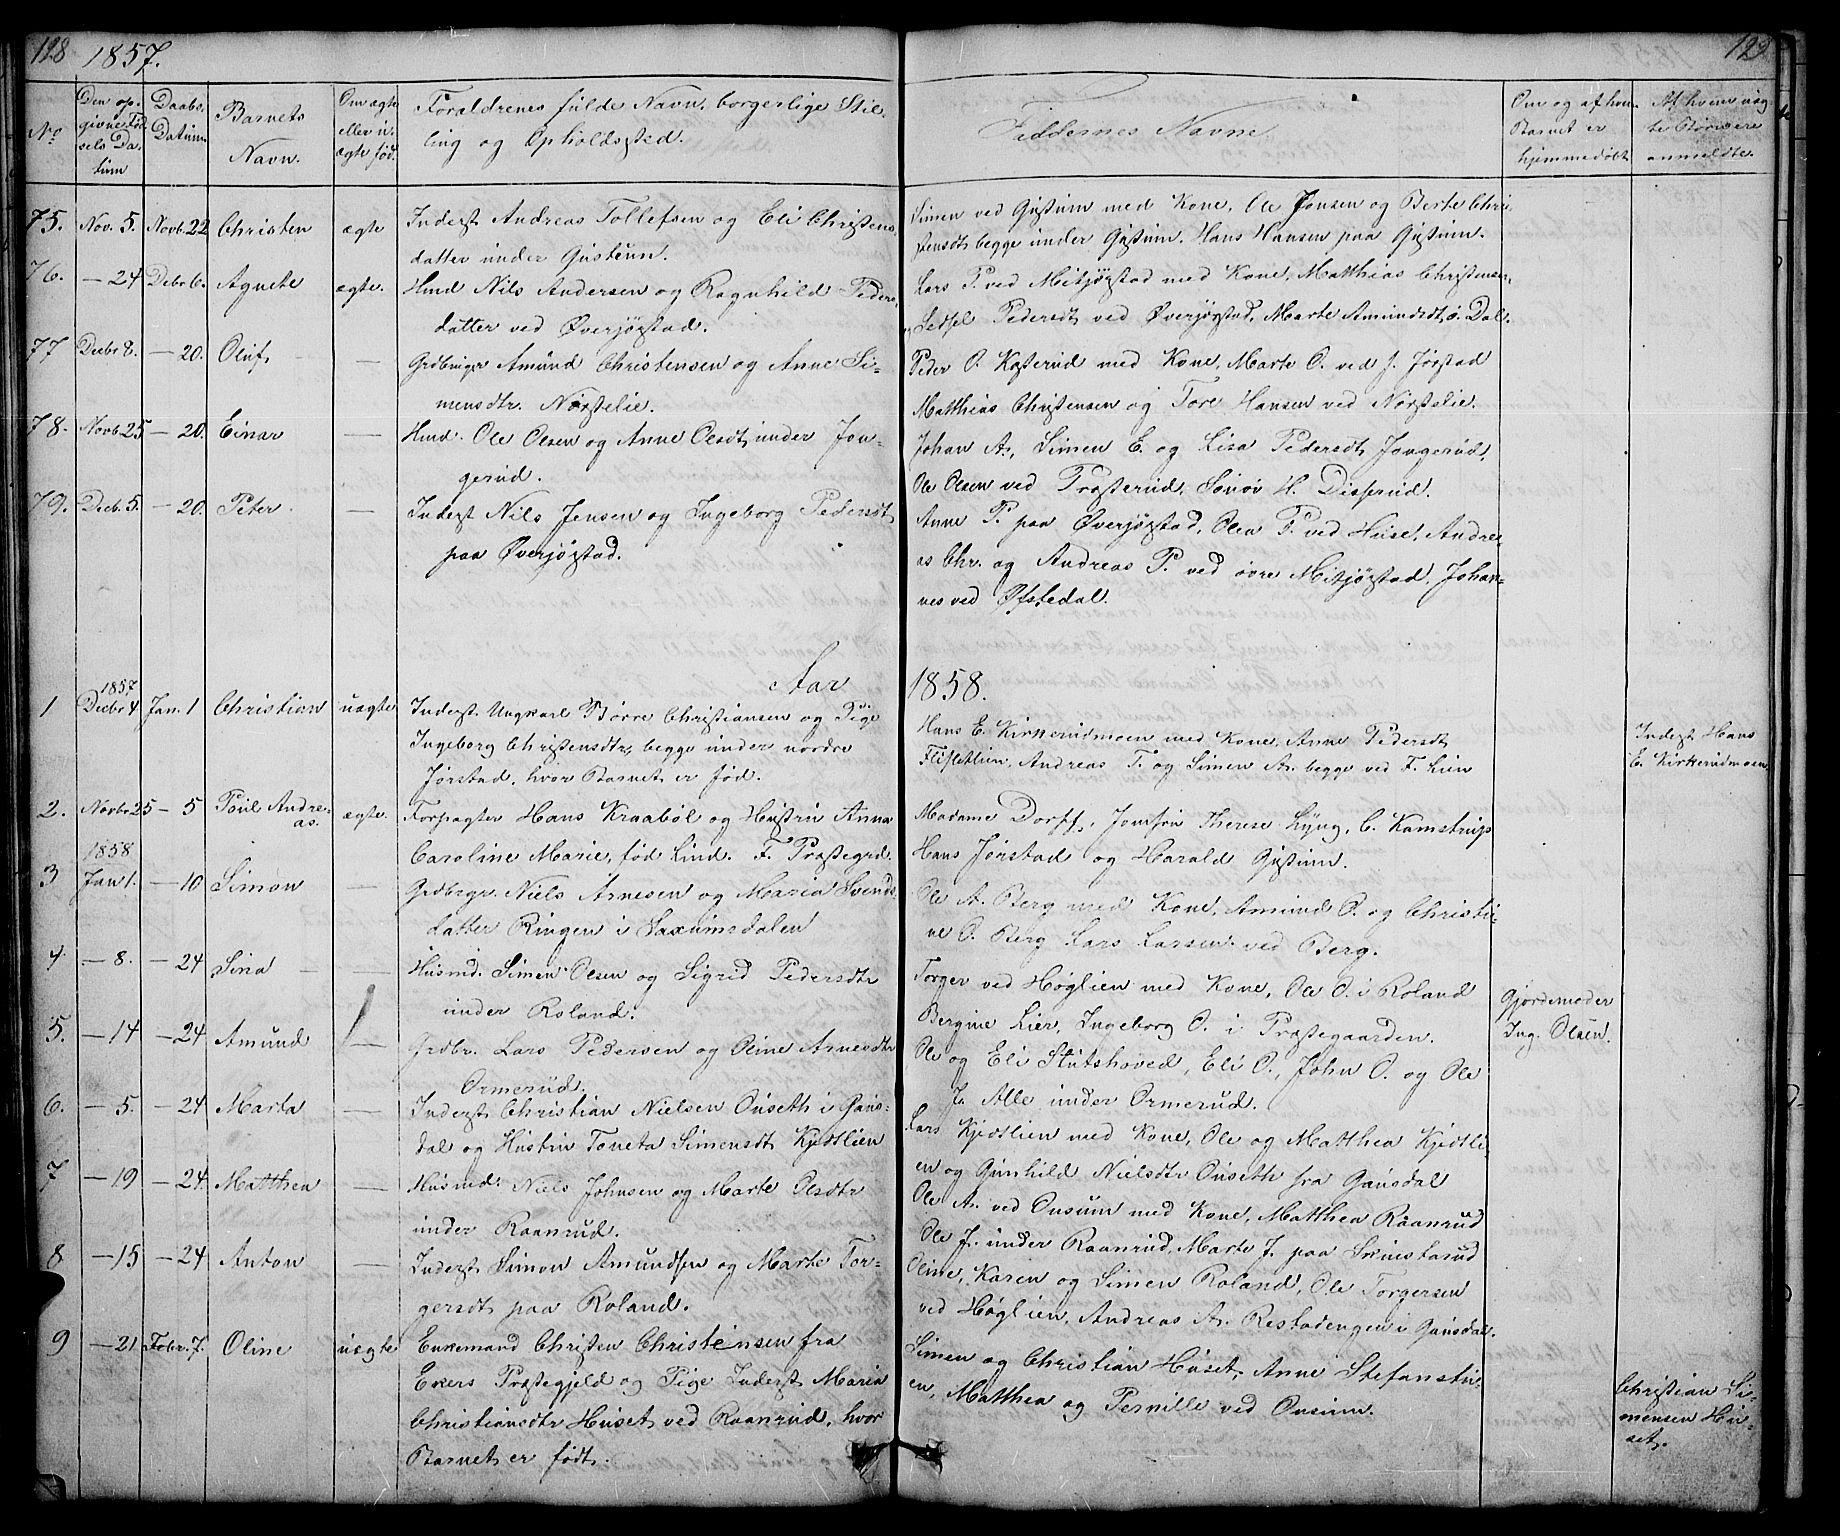 SAH, Fåberg prestekontor, Klokkerbok nr. 5, 1837-1864, s. 128-129